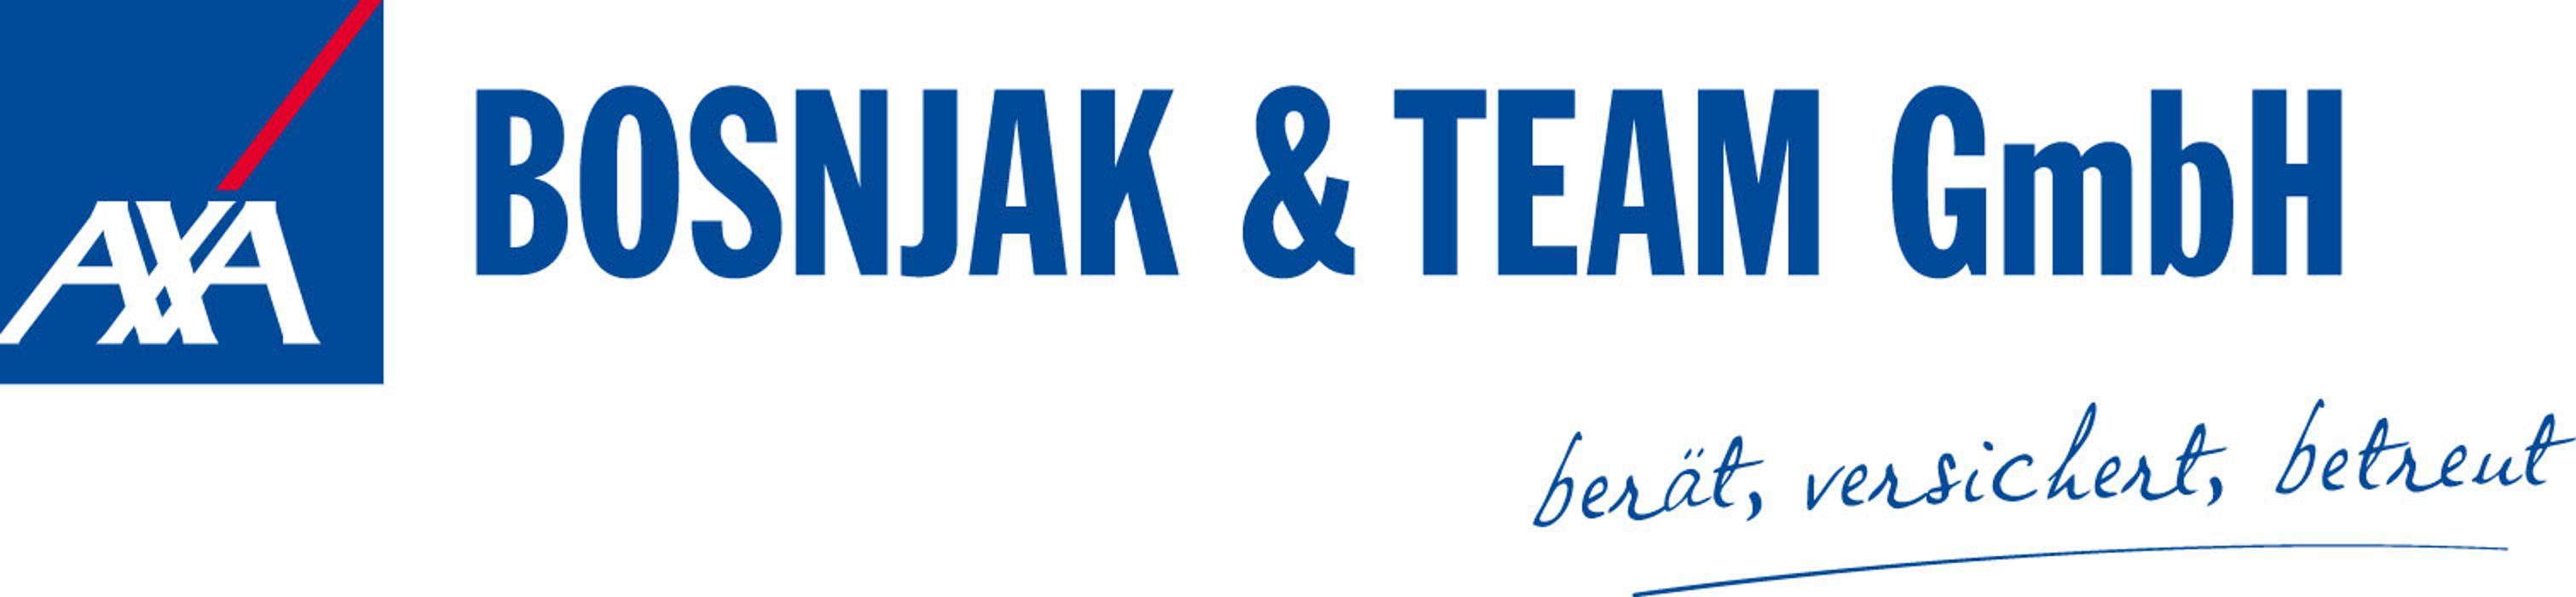 Bild zu AXA Stuttgart - Bosnjak & Team GmbH in Stuttgart